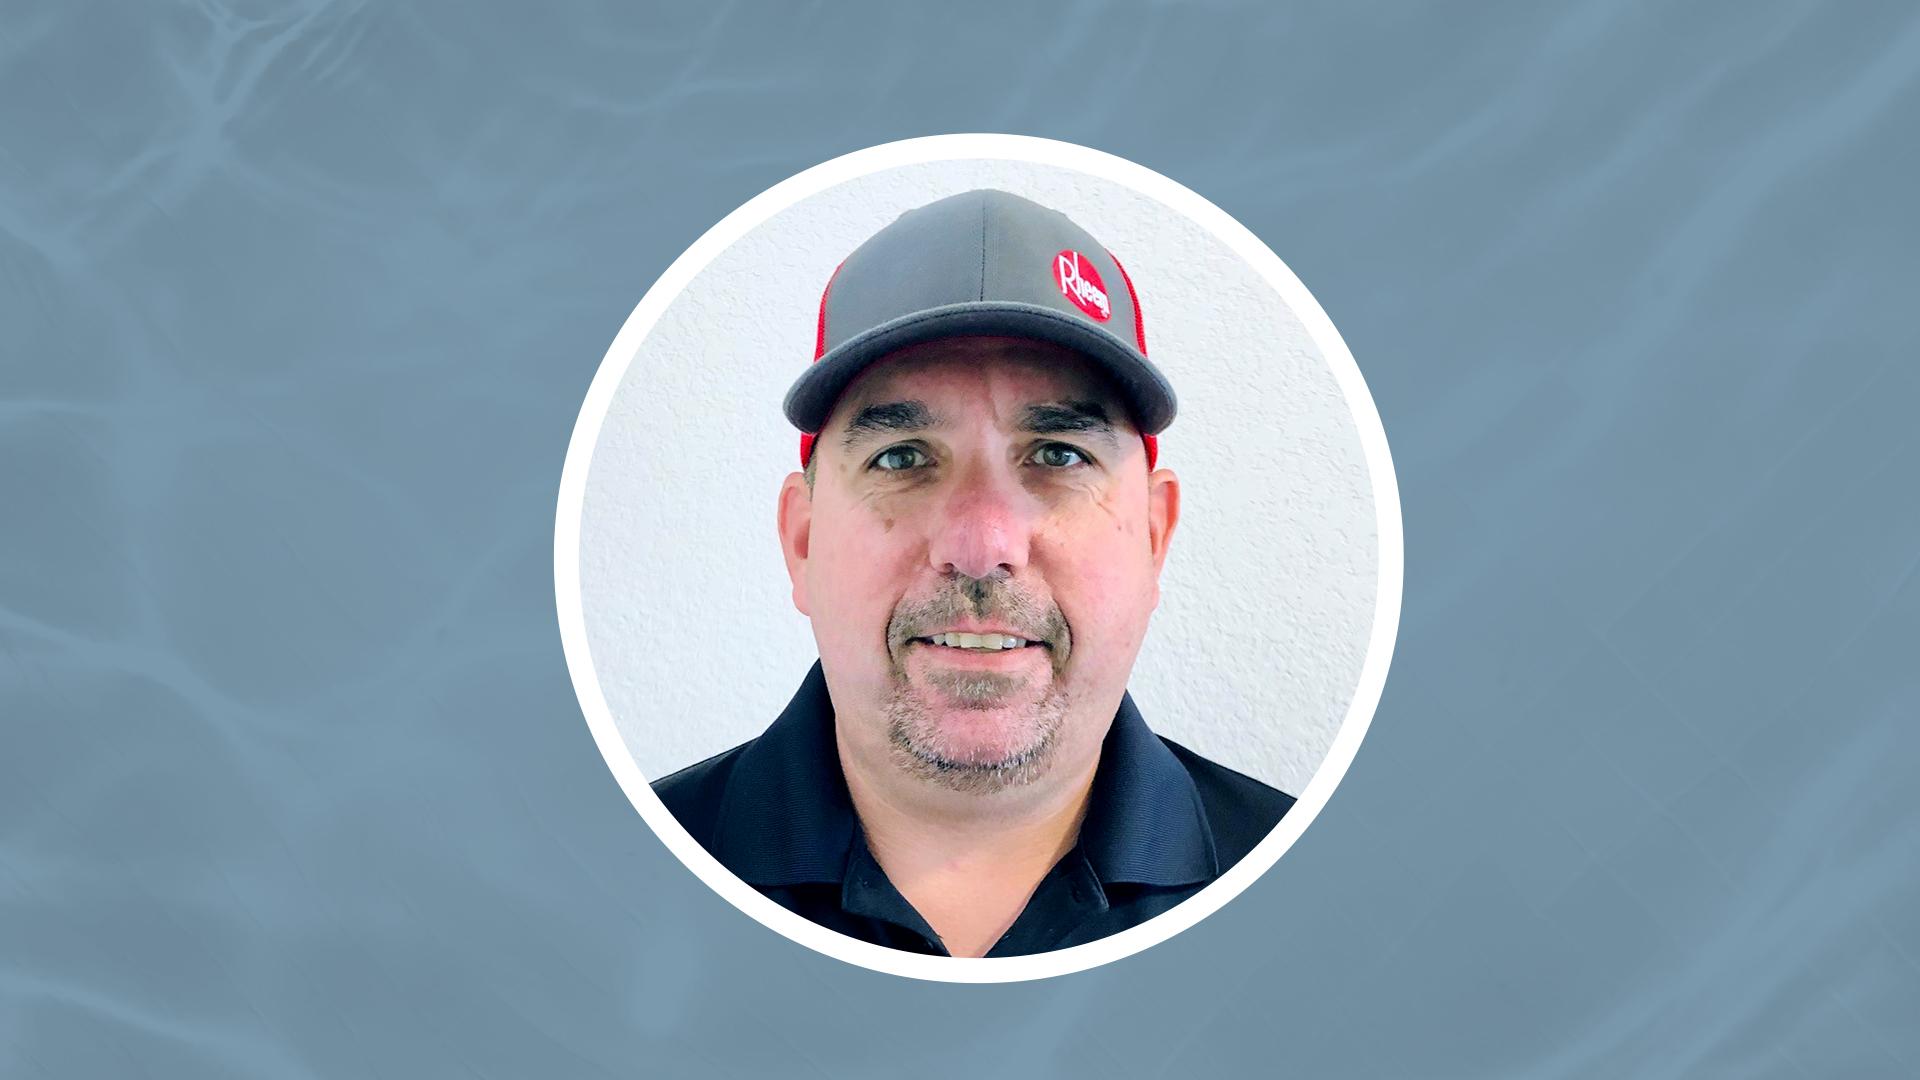 Plumber Support Manager Chris Eppley